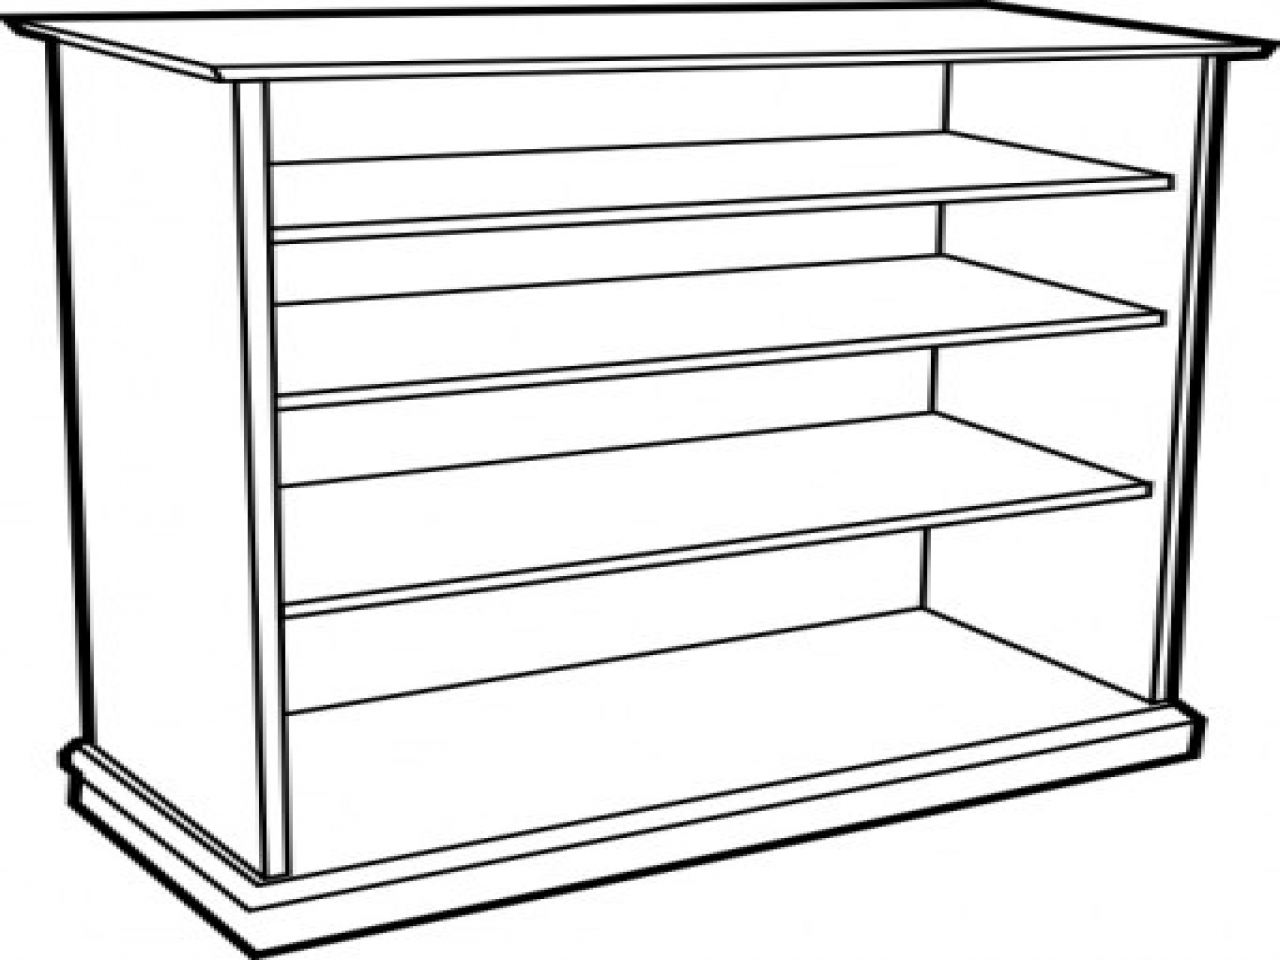 1280x960 Bookshelves Clipart Black And White New Property Sofa